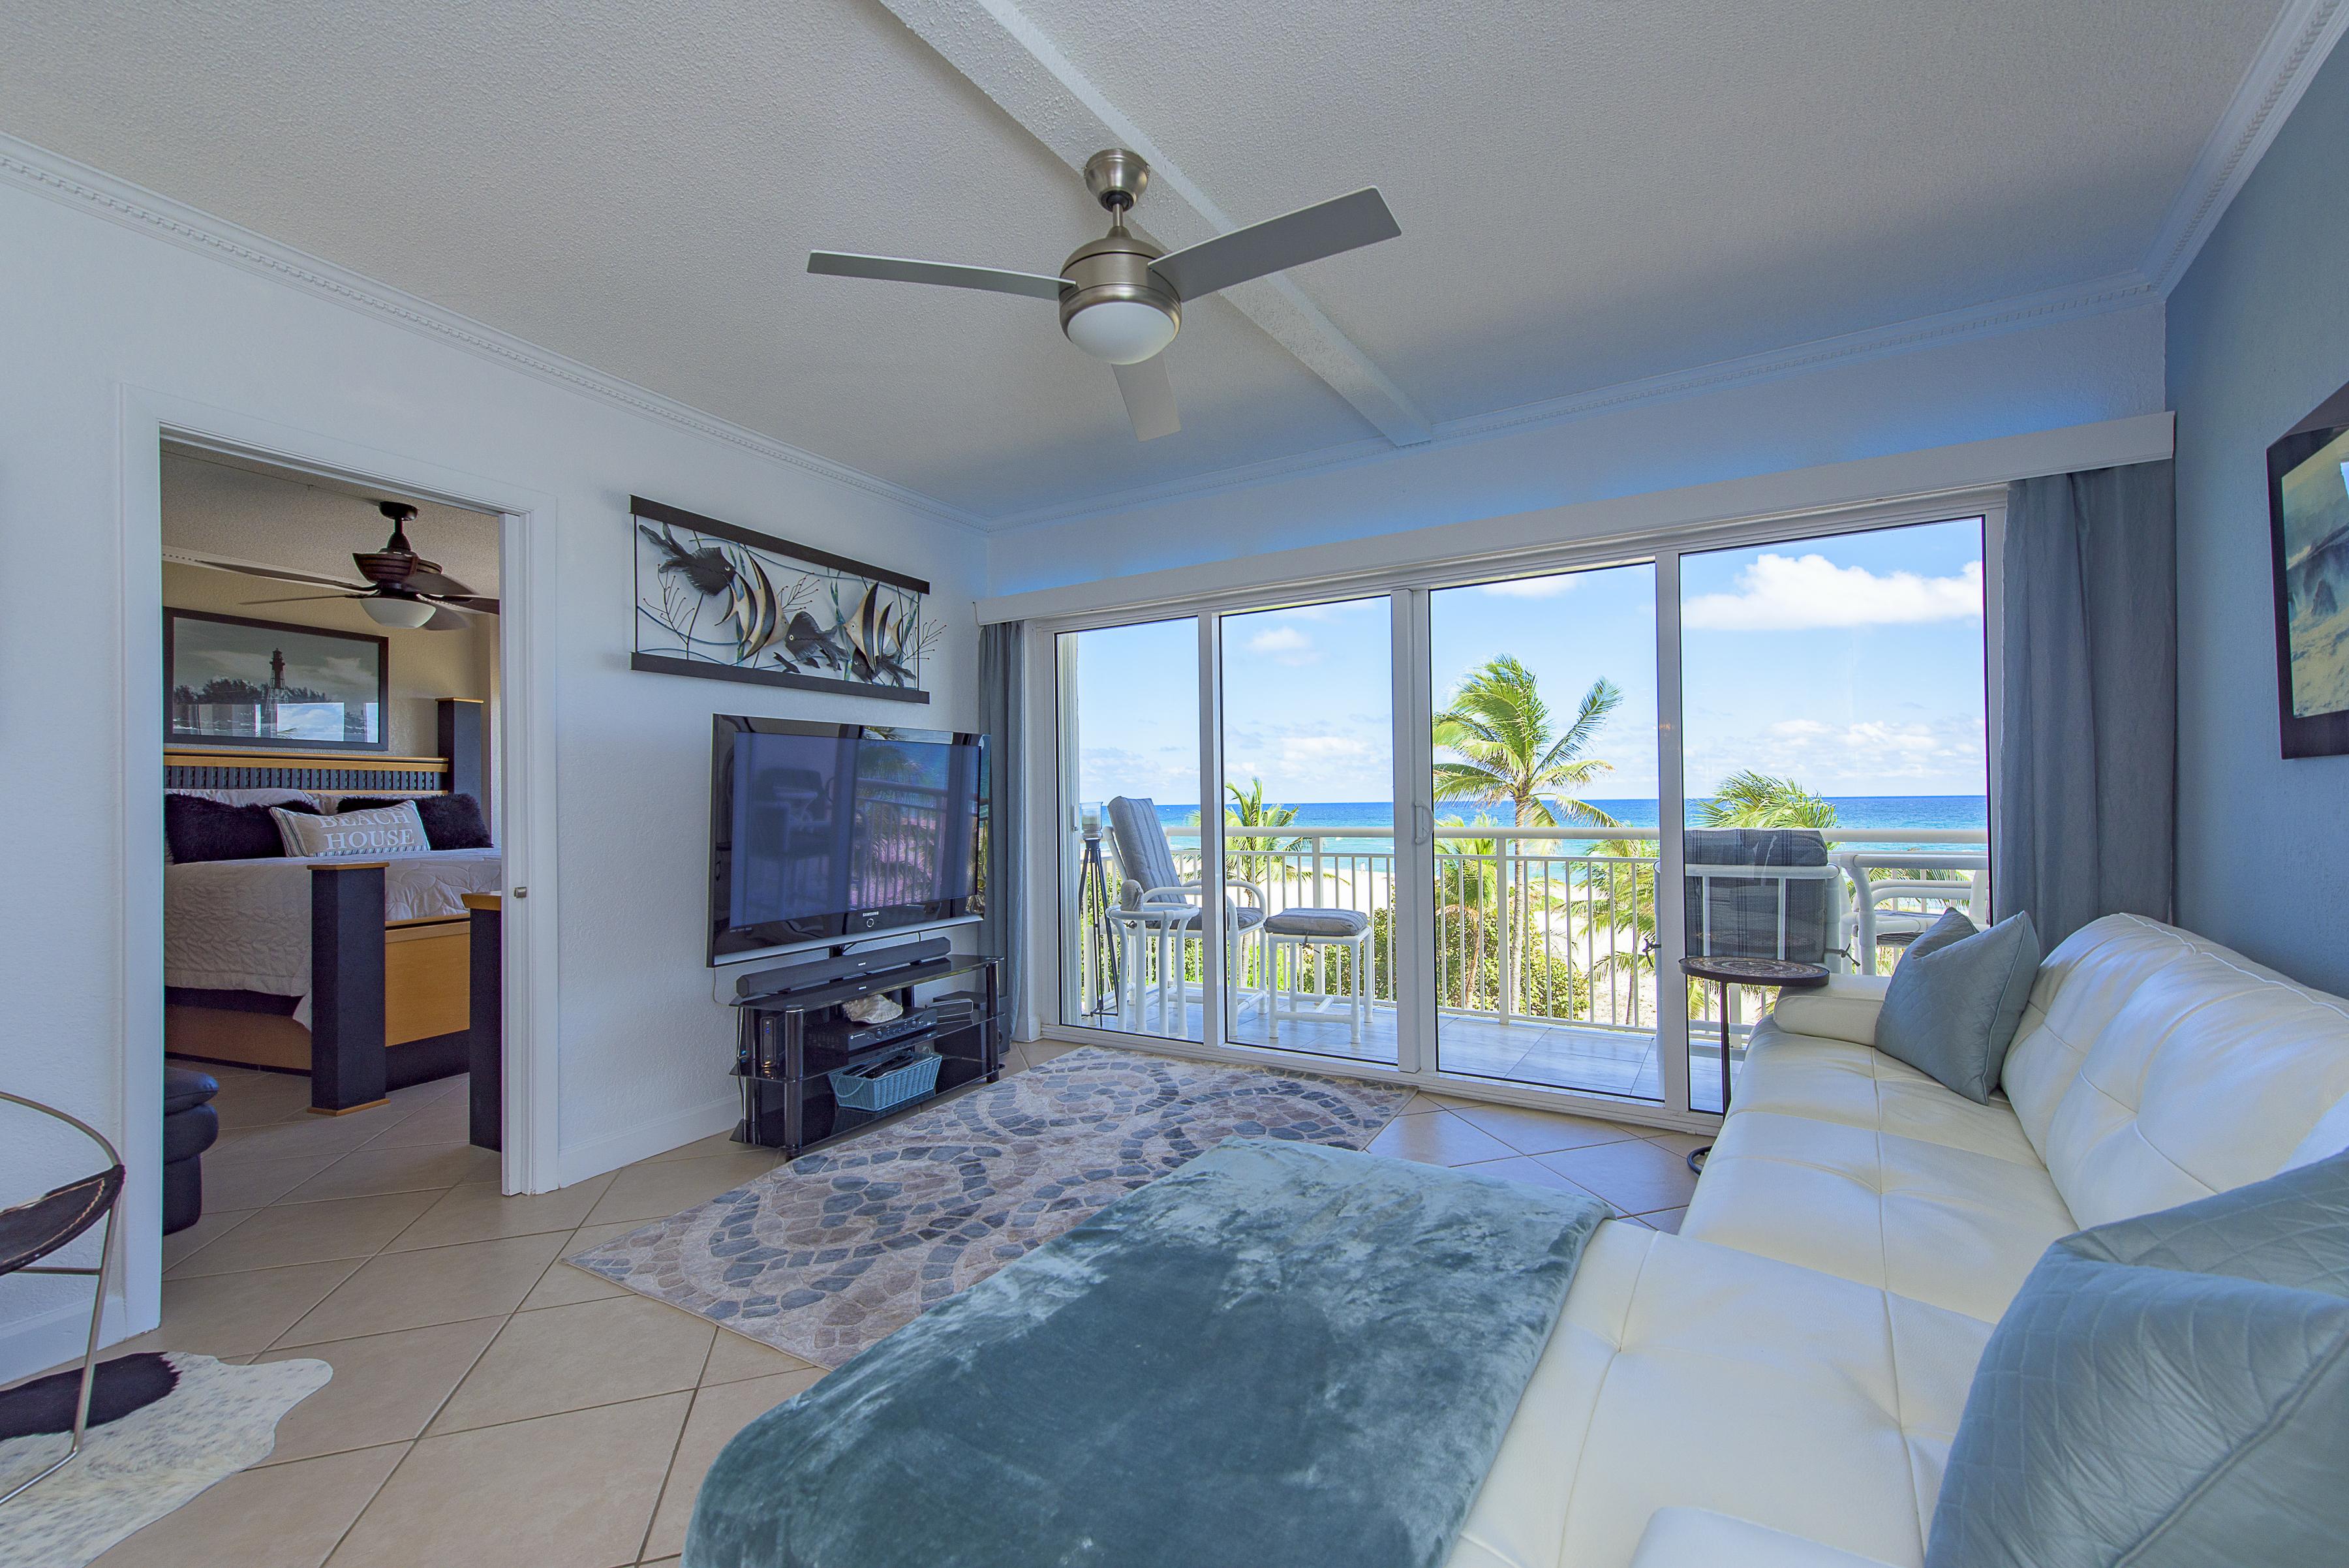 710 N OCEAN BLVD UNIT 306 - Real Estate Broker